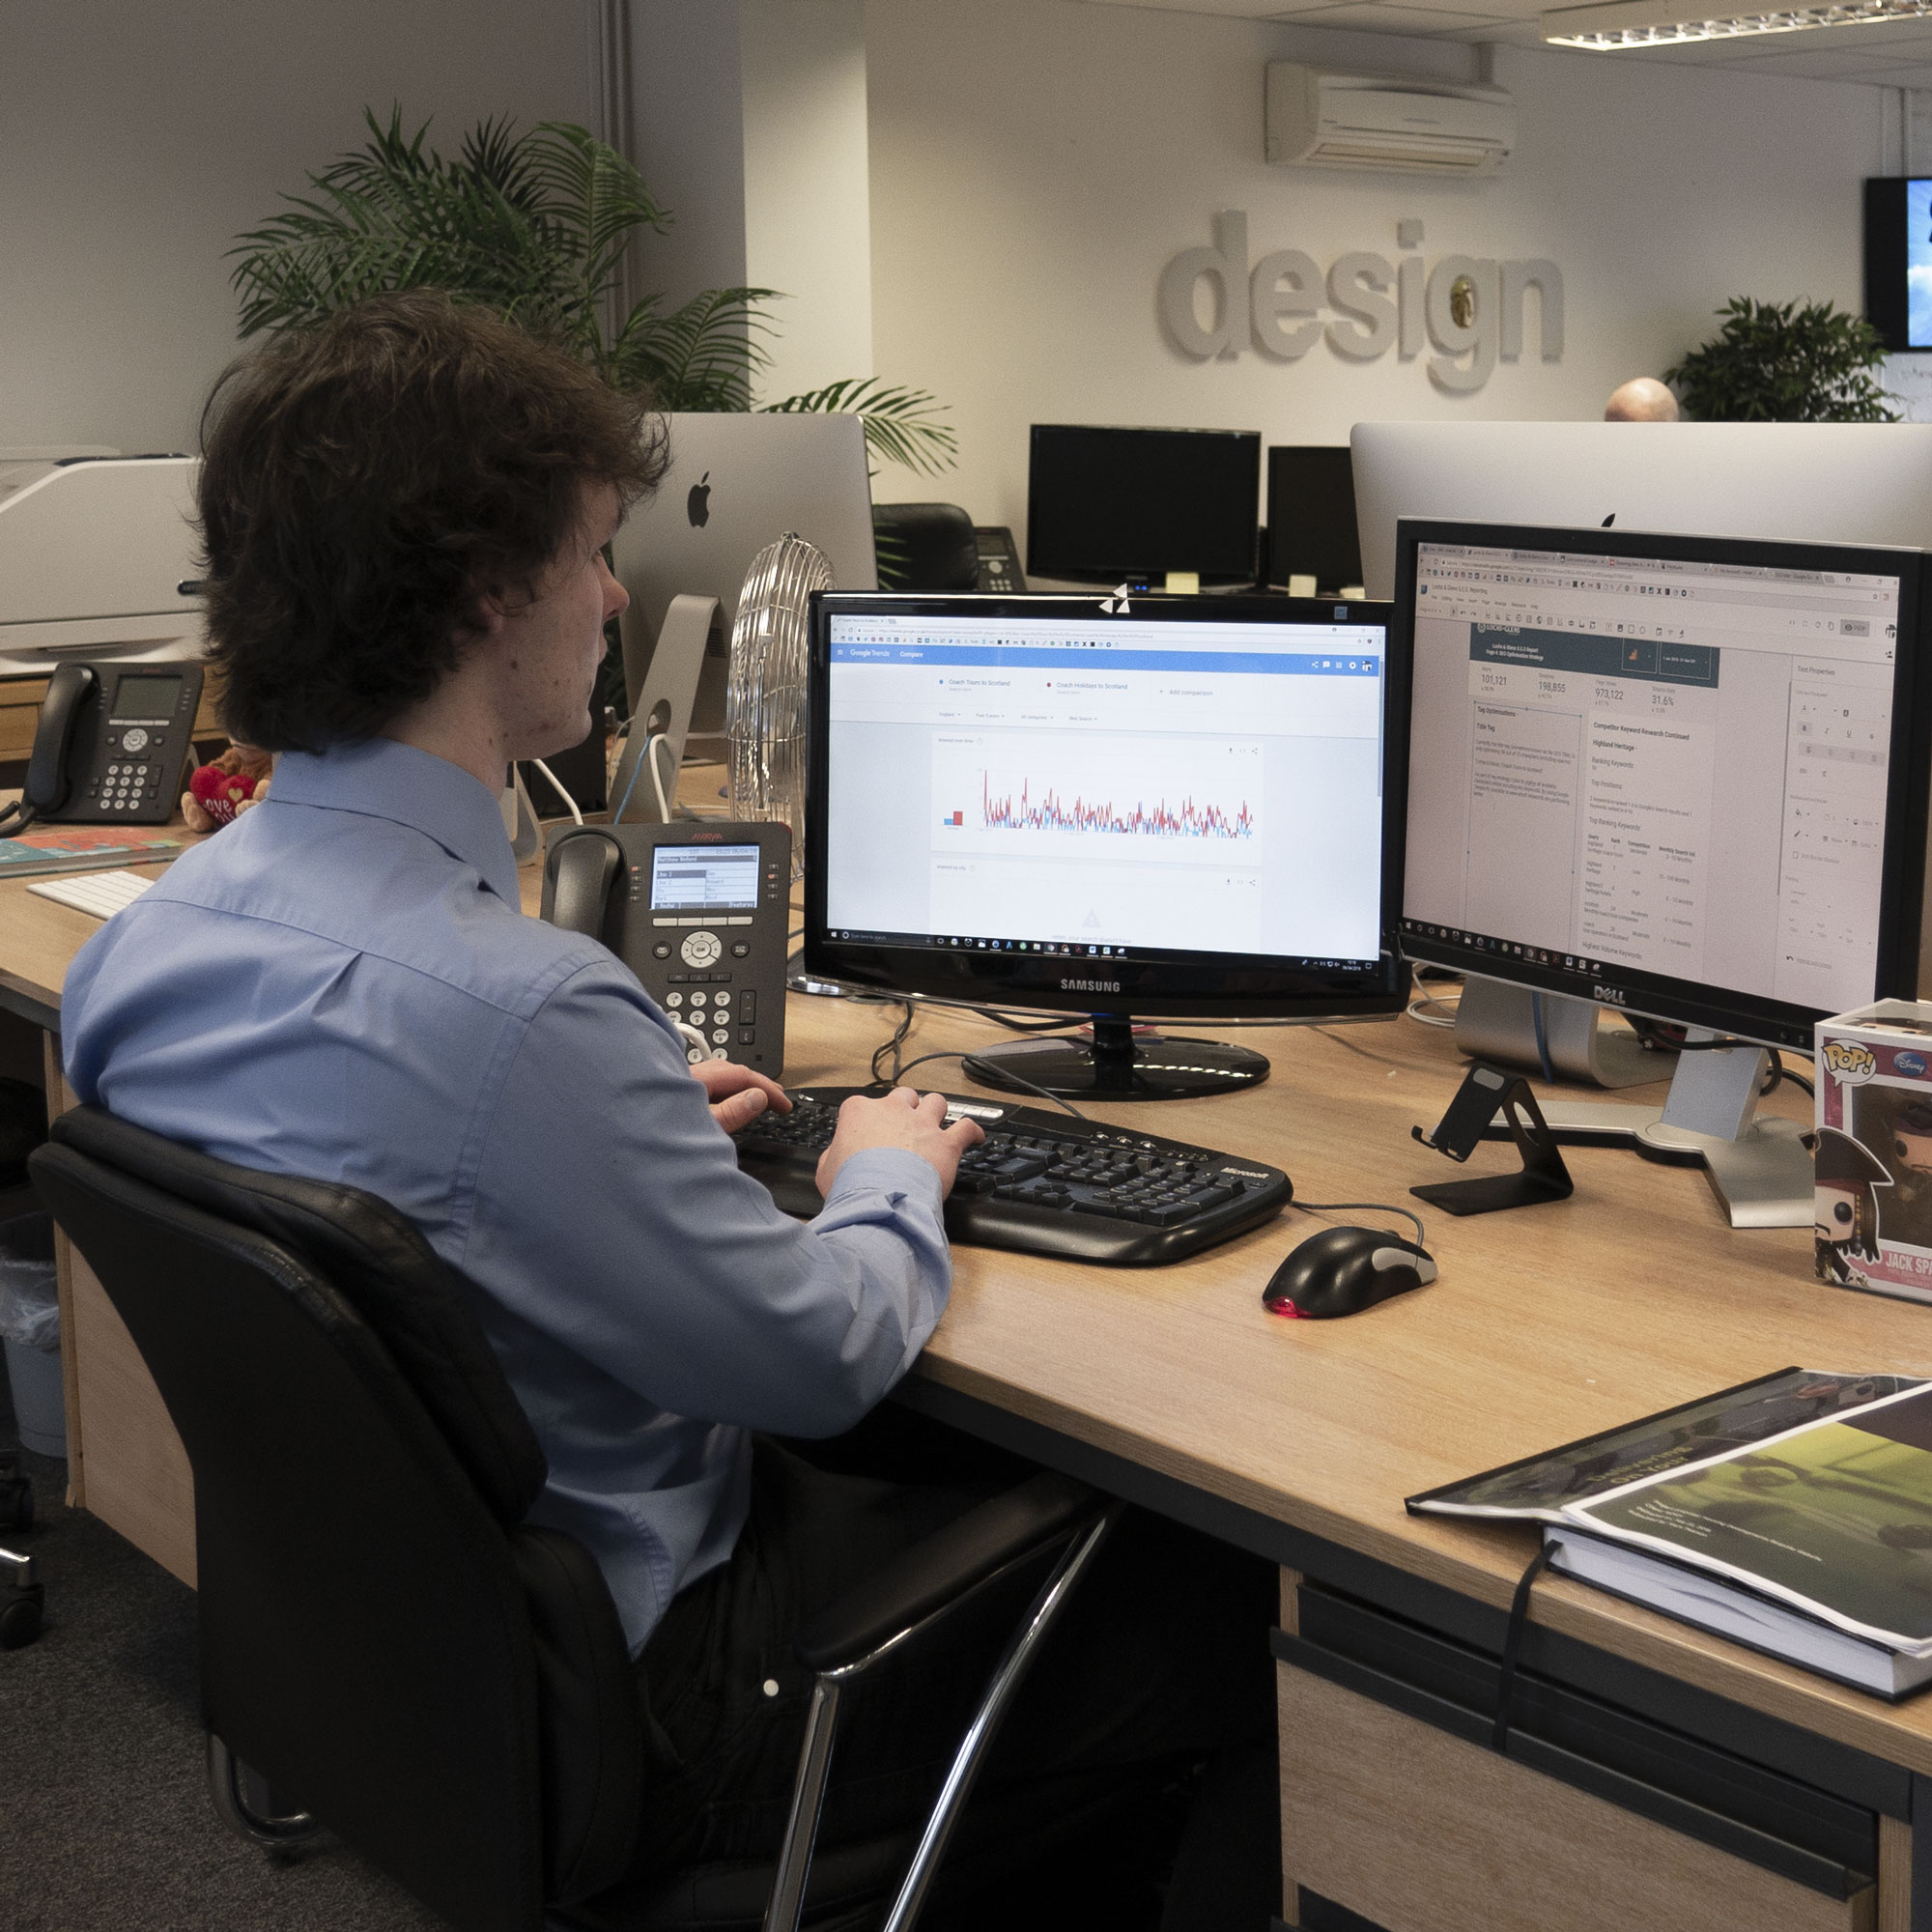 SEO & PPC | Inventive Digital Marketing, Website and Graphic